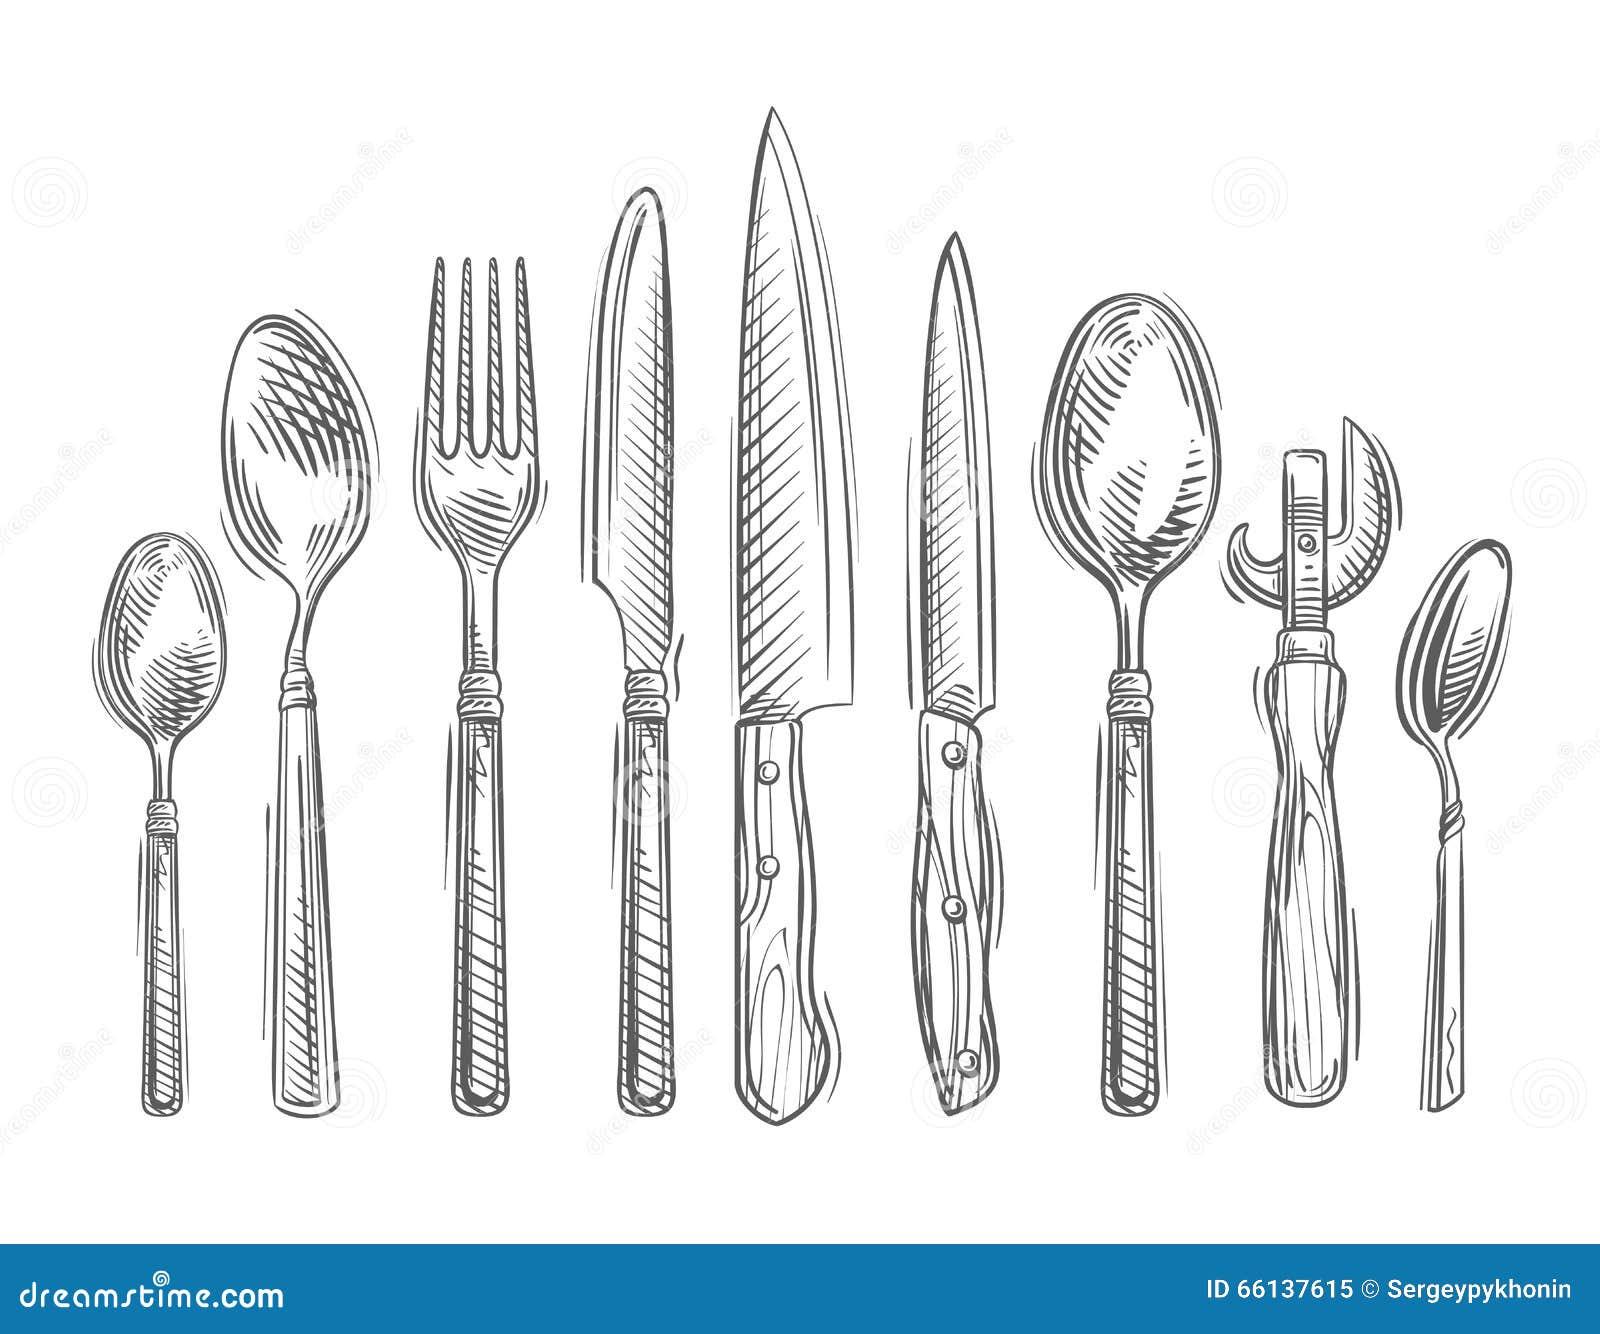 Kitchen tools drawing - Royalty Free Vector